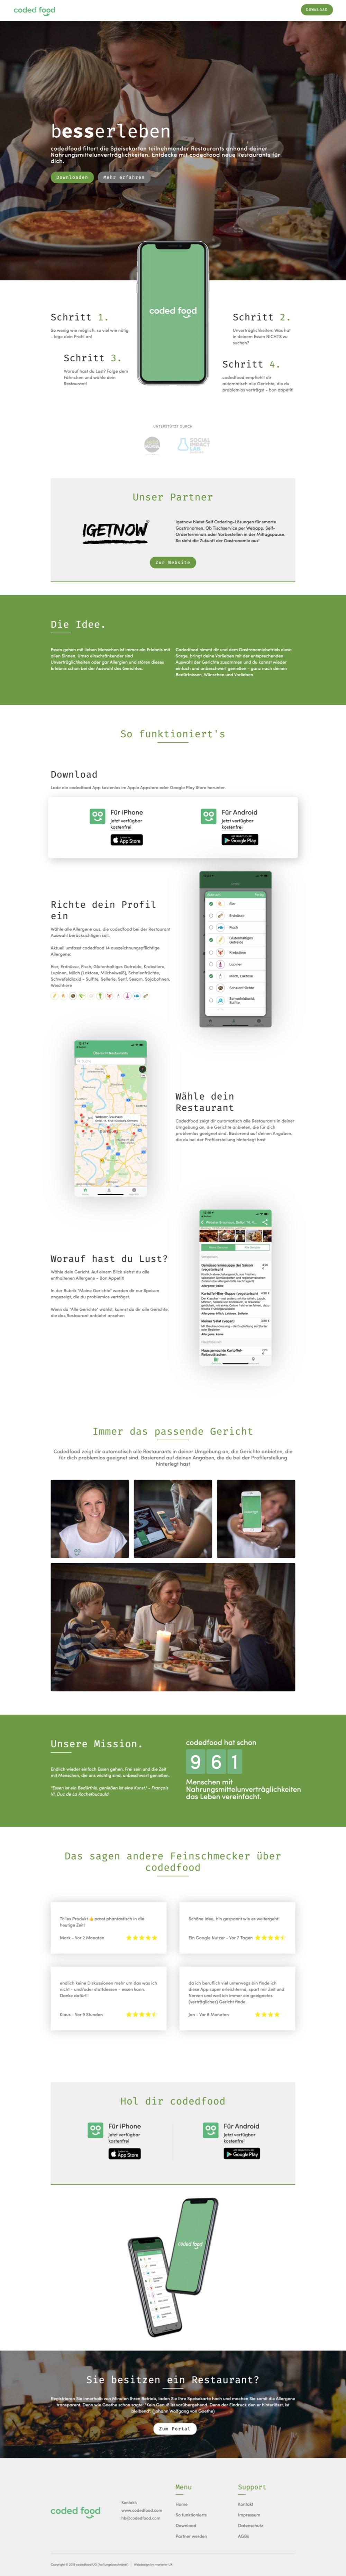 Webdesign Beispiel codedfood.com